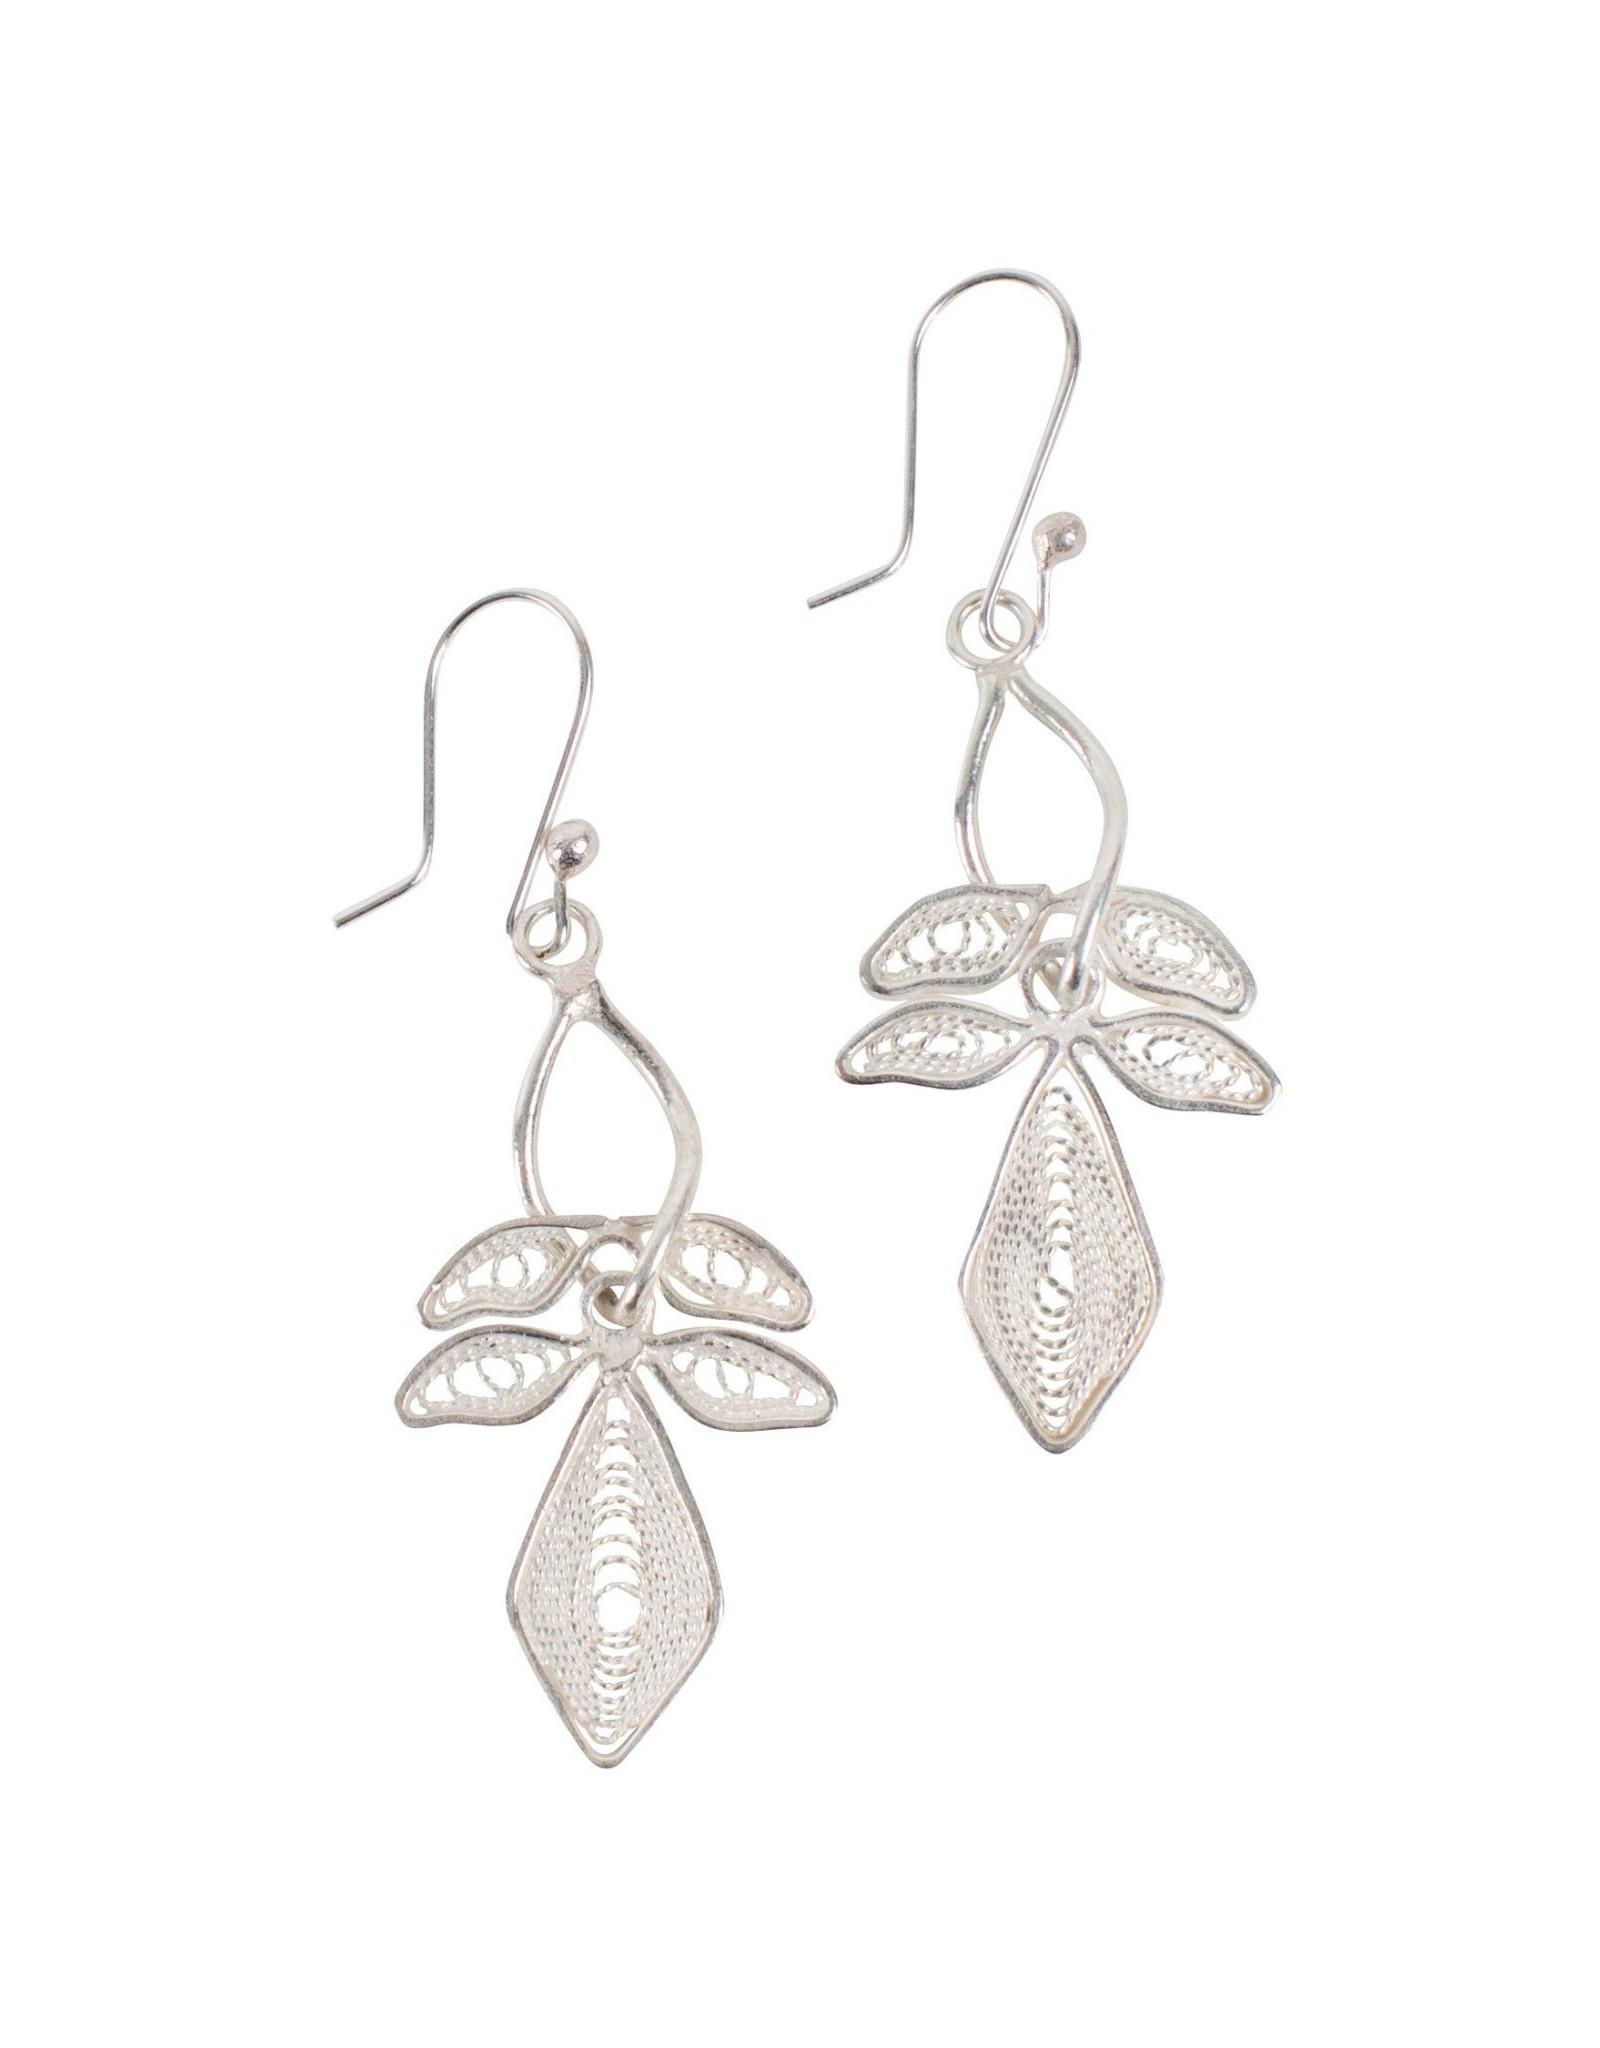 Lily Filigree Earrings